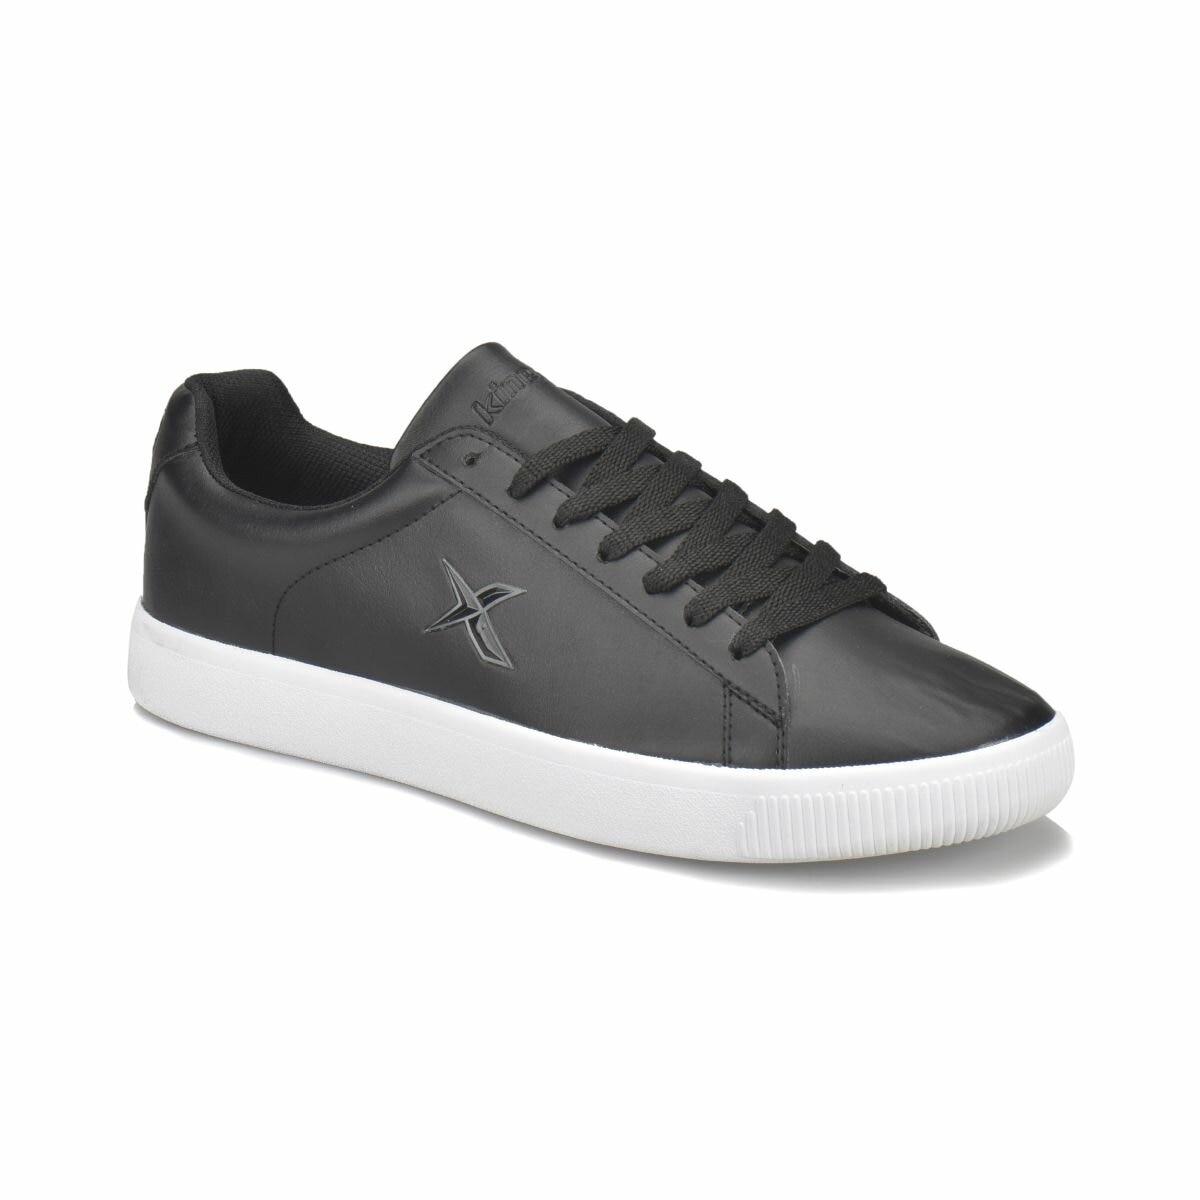 FLO DUPLO PU M Black Men 'S Sneaker Shoes KINETIX